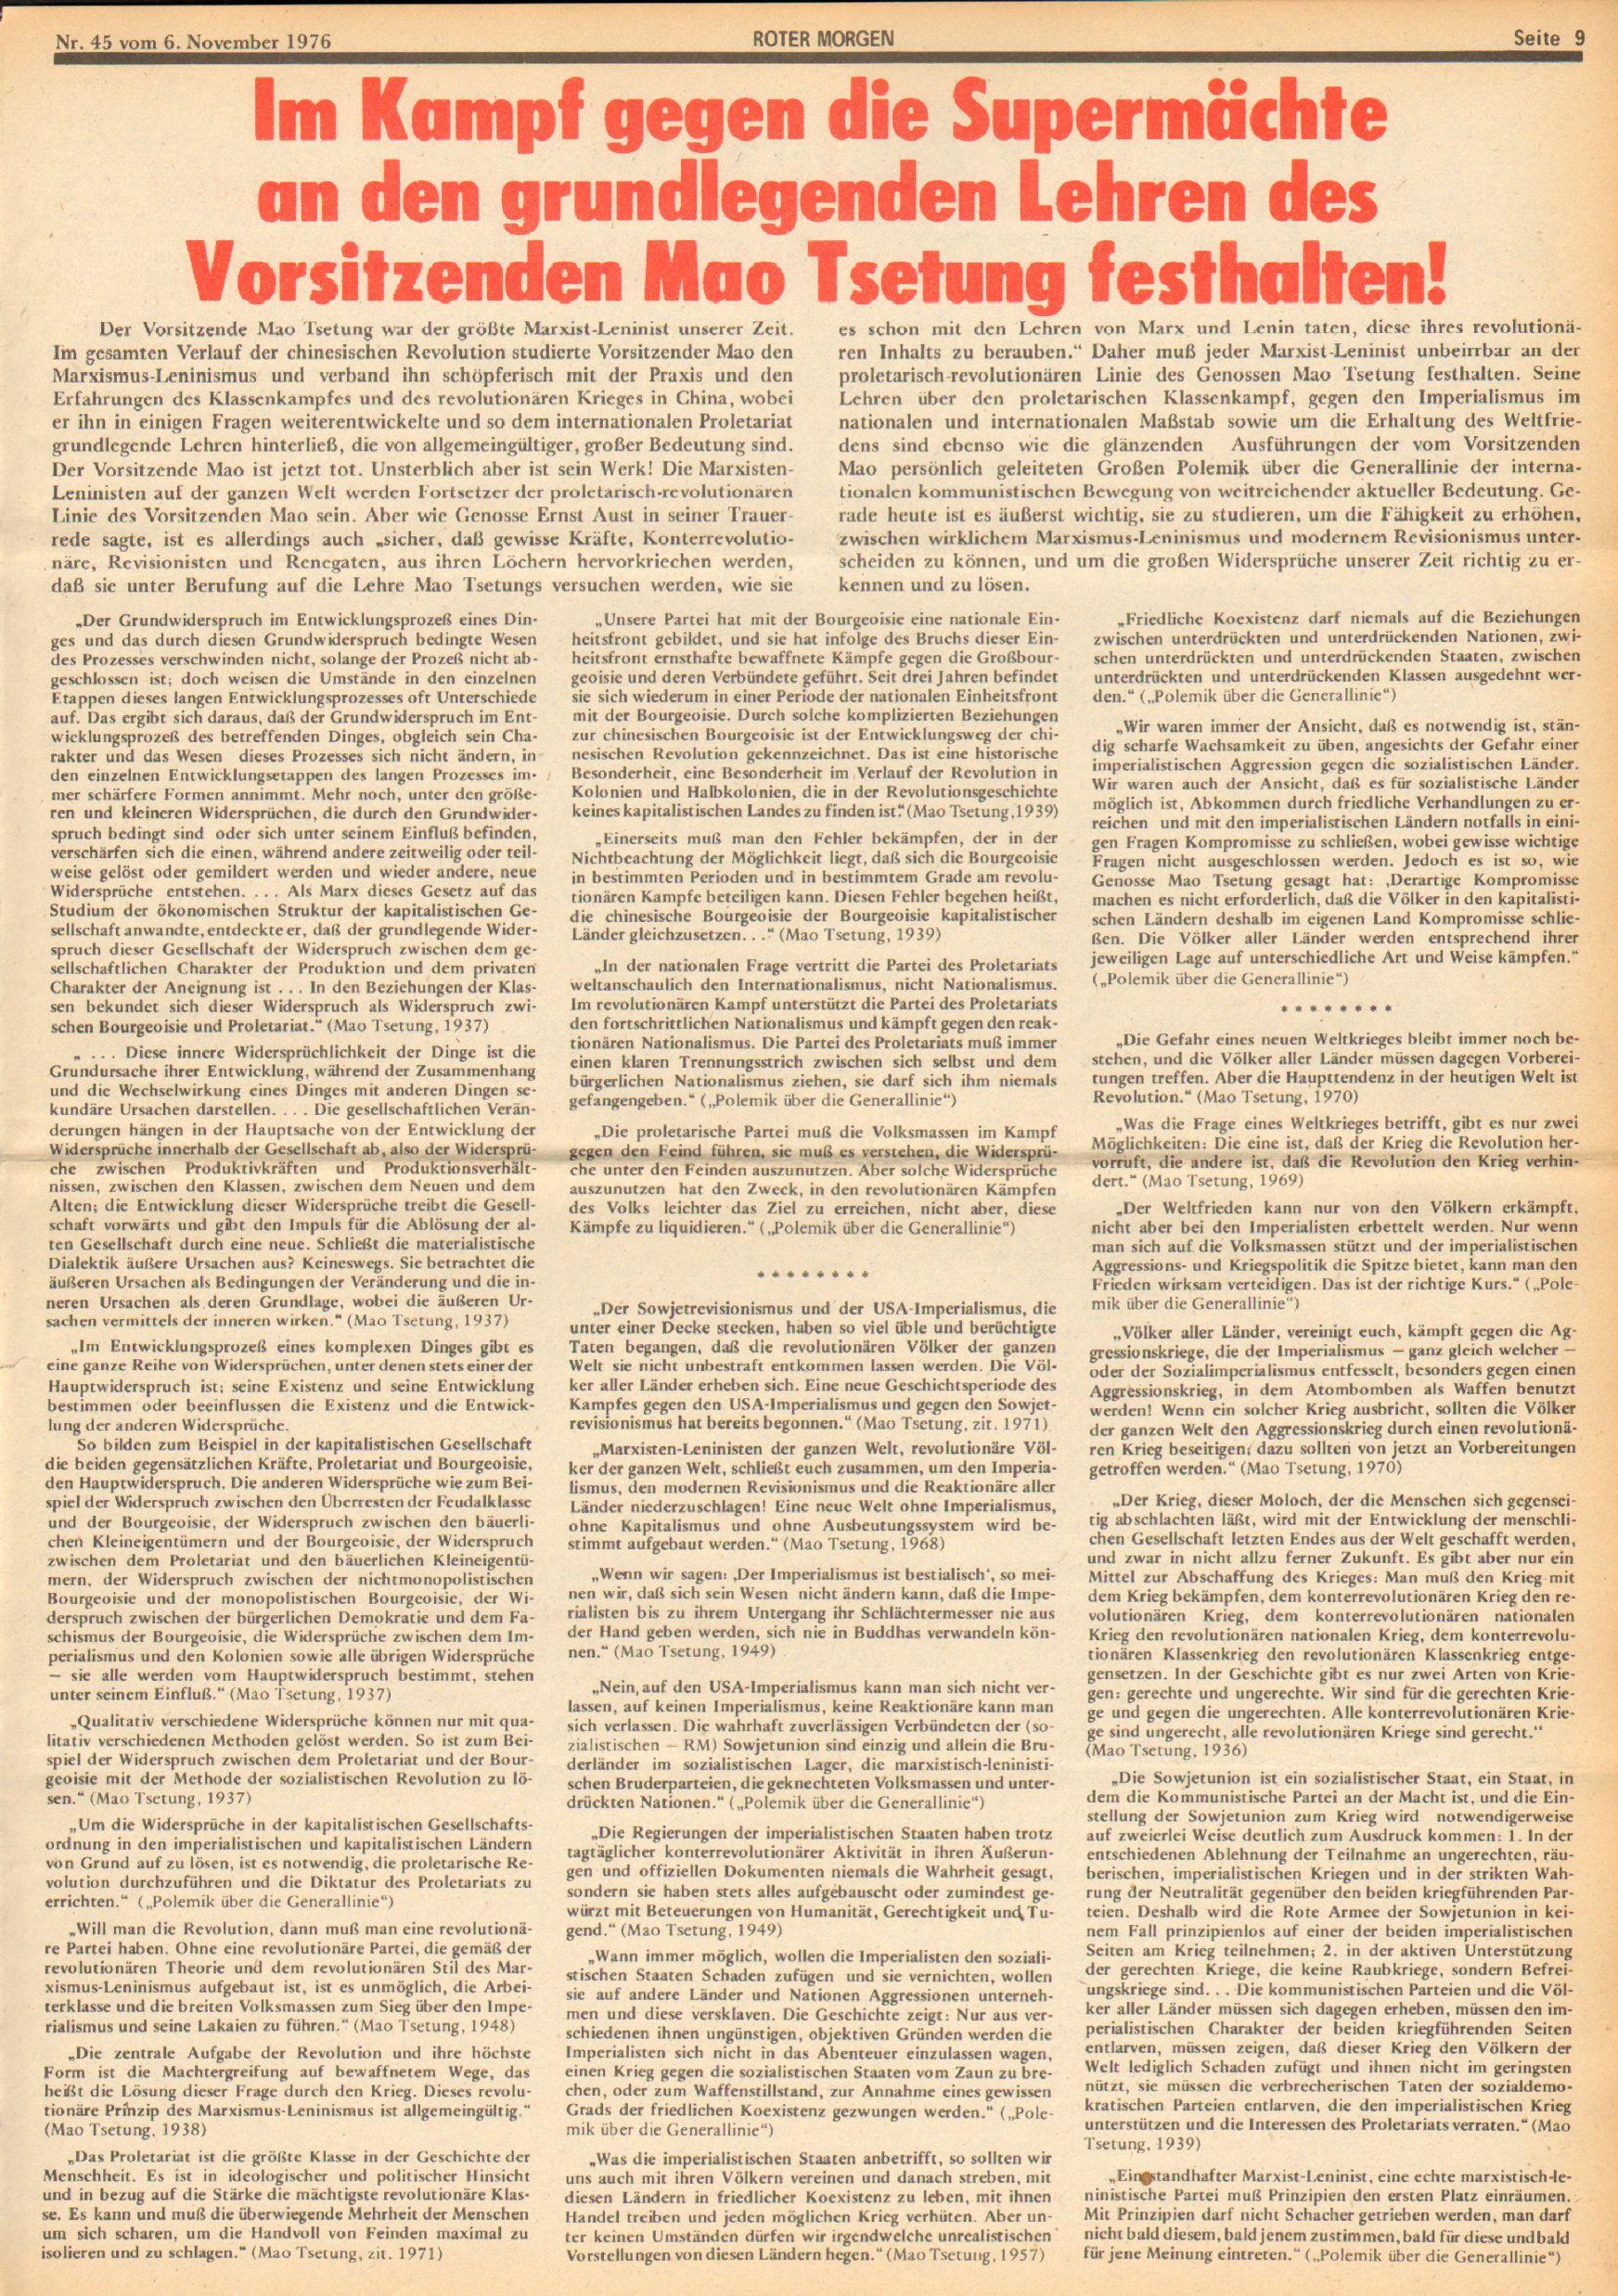 Roter Morgen, 10. Jg., 6. November 1976, Nr. 45, Seite 9